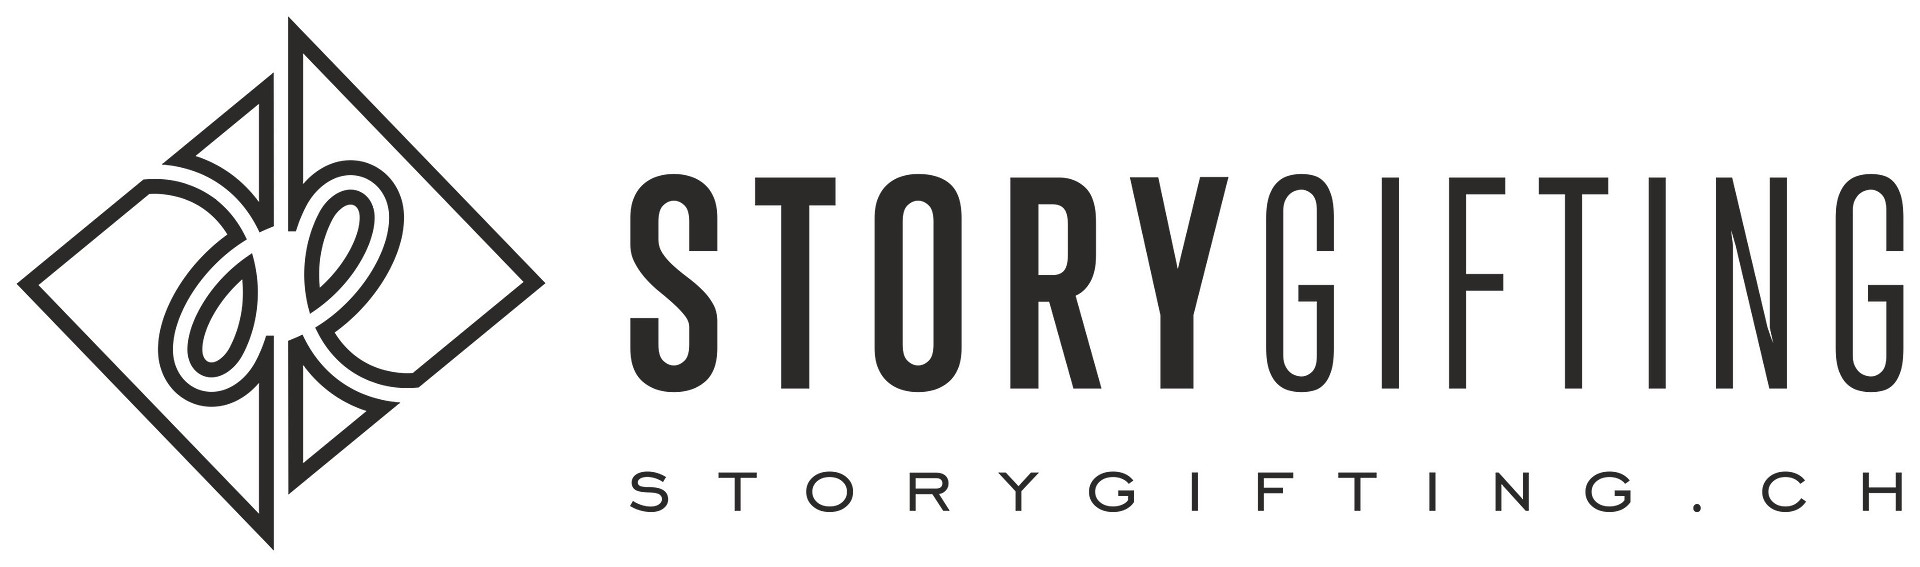 storygifting